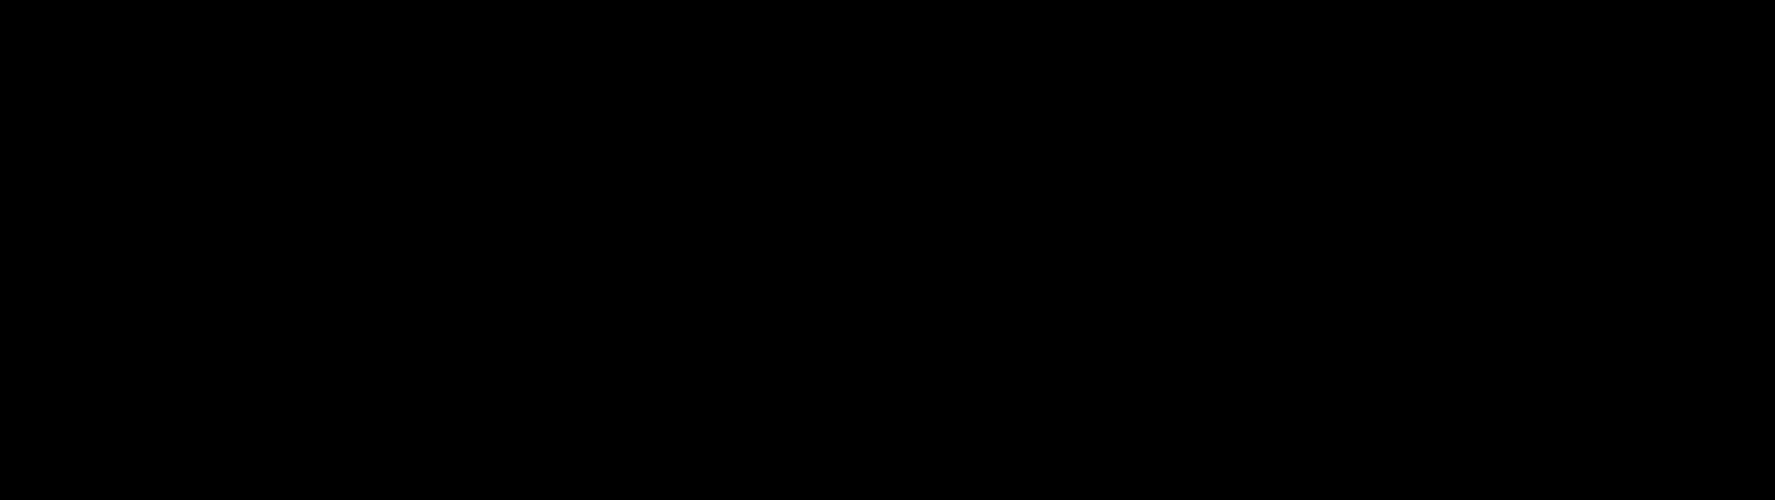 2010-logo-black.png